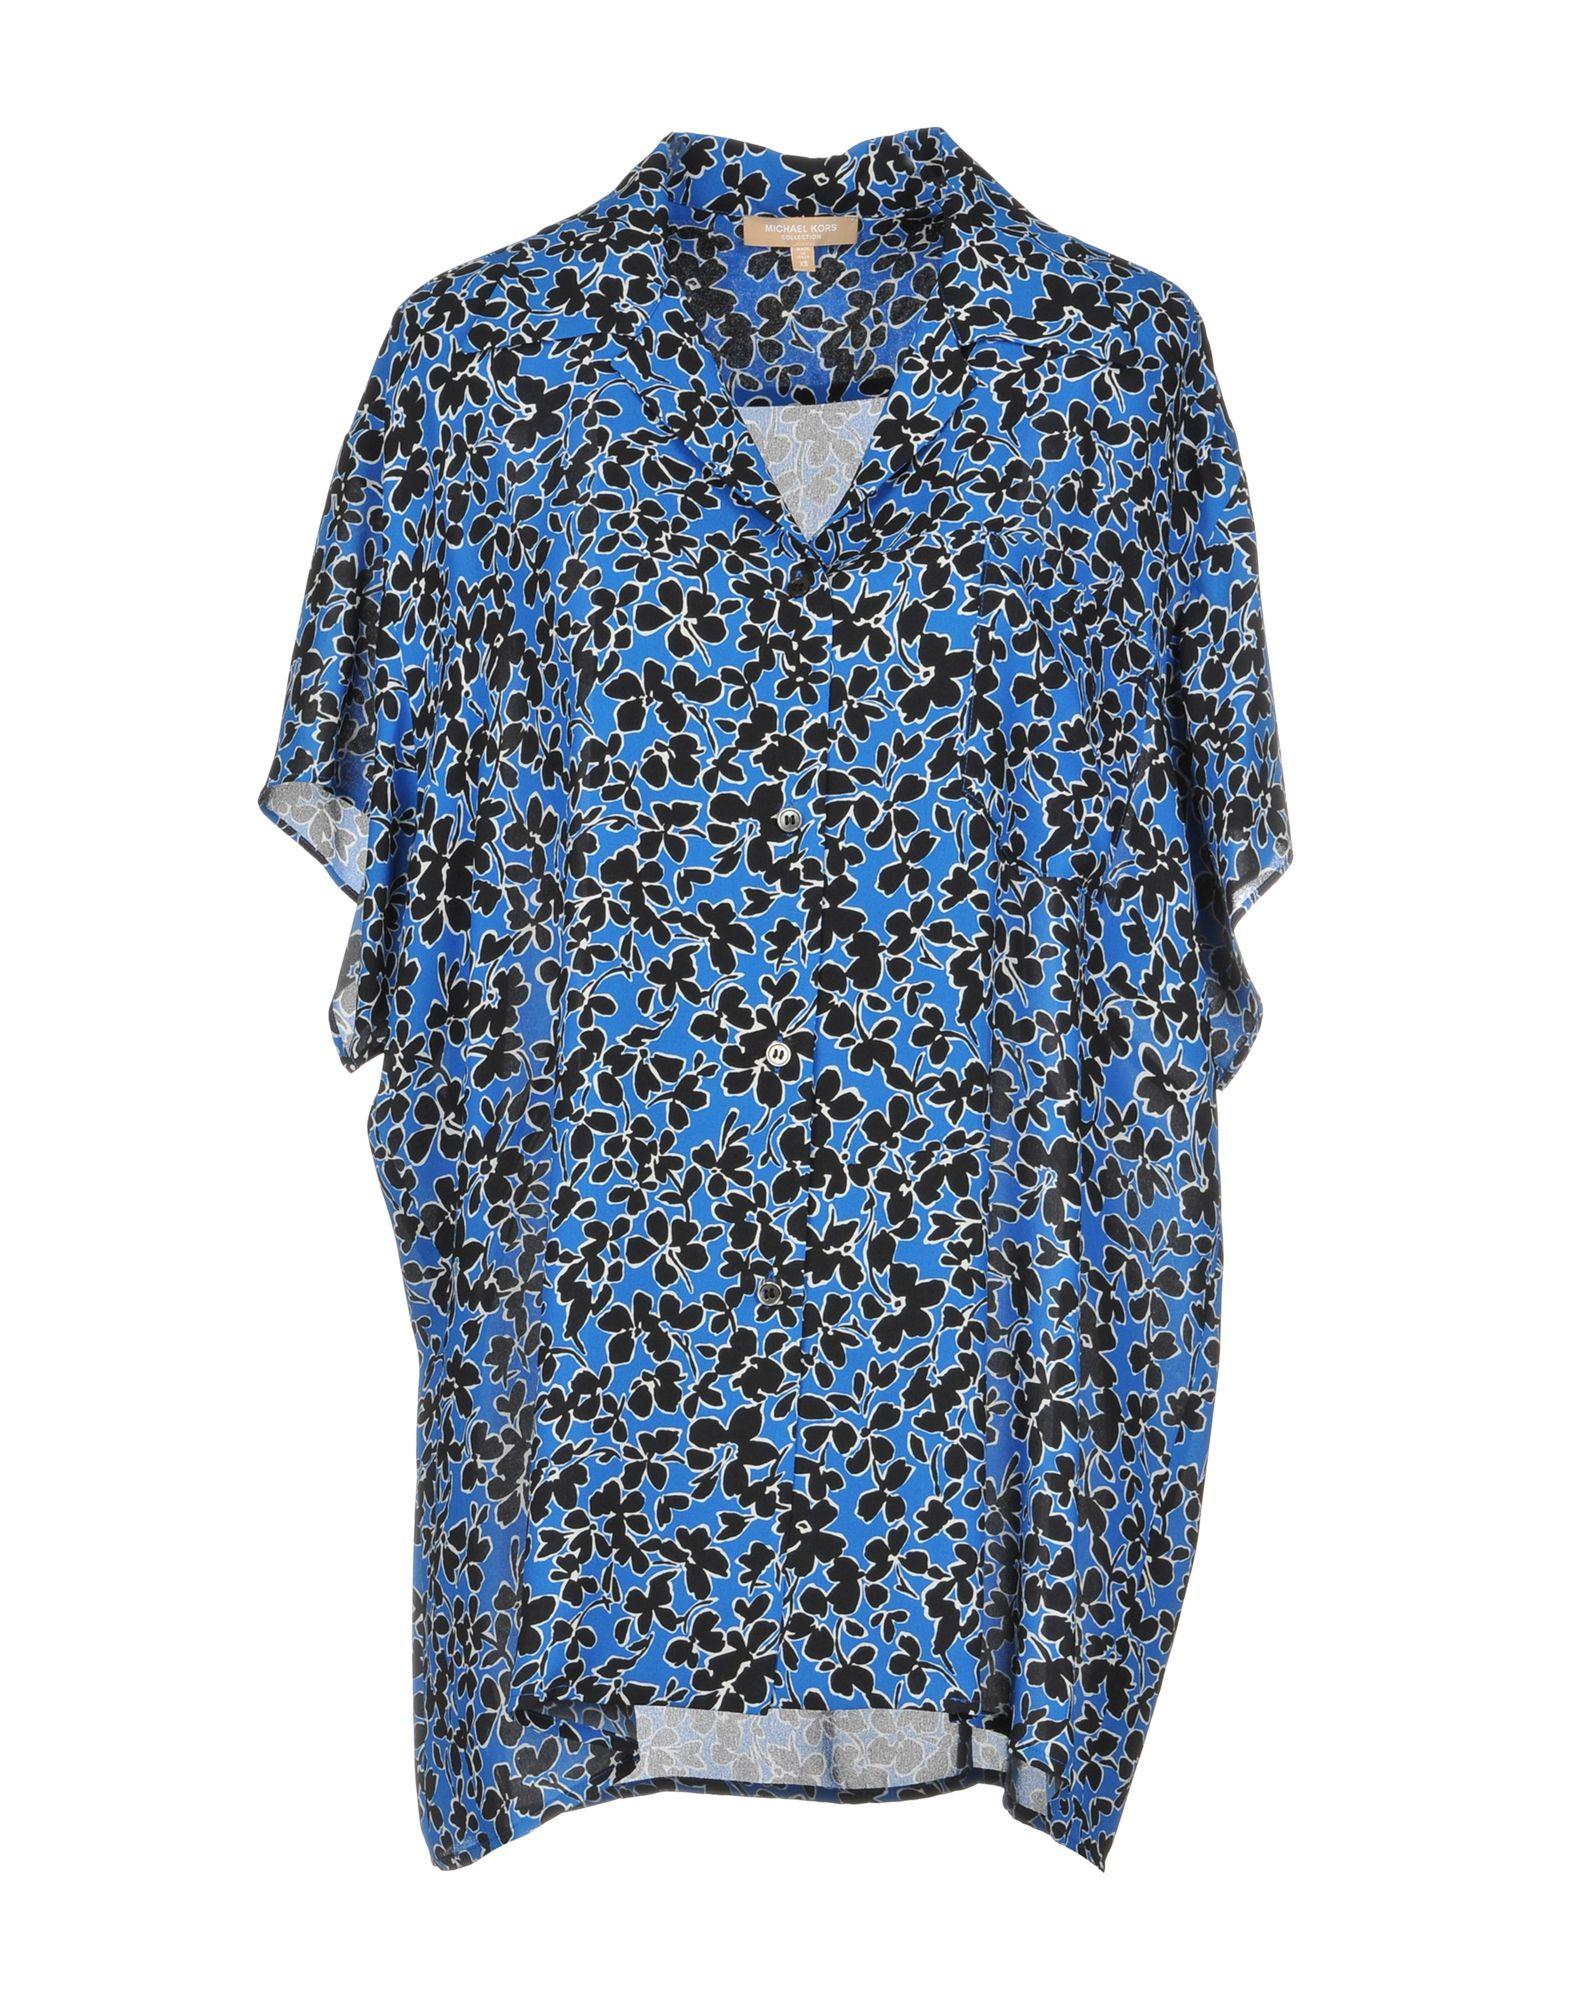 MICHAEL KORS COLLECTION Shirts - Item 38766117